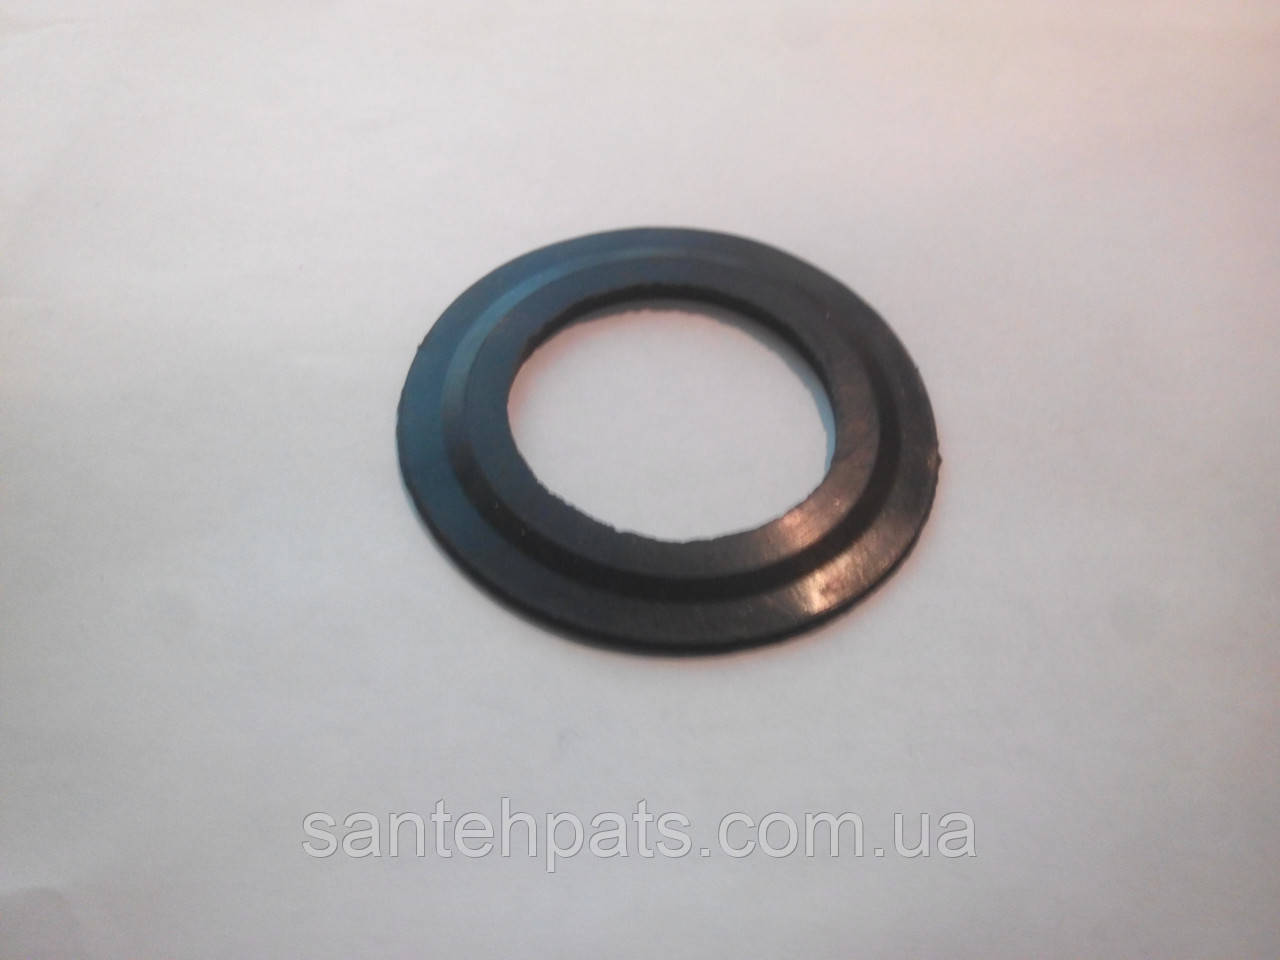 Мембрана арматуры бачка унитаза 58х31,5х3 мм